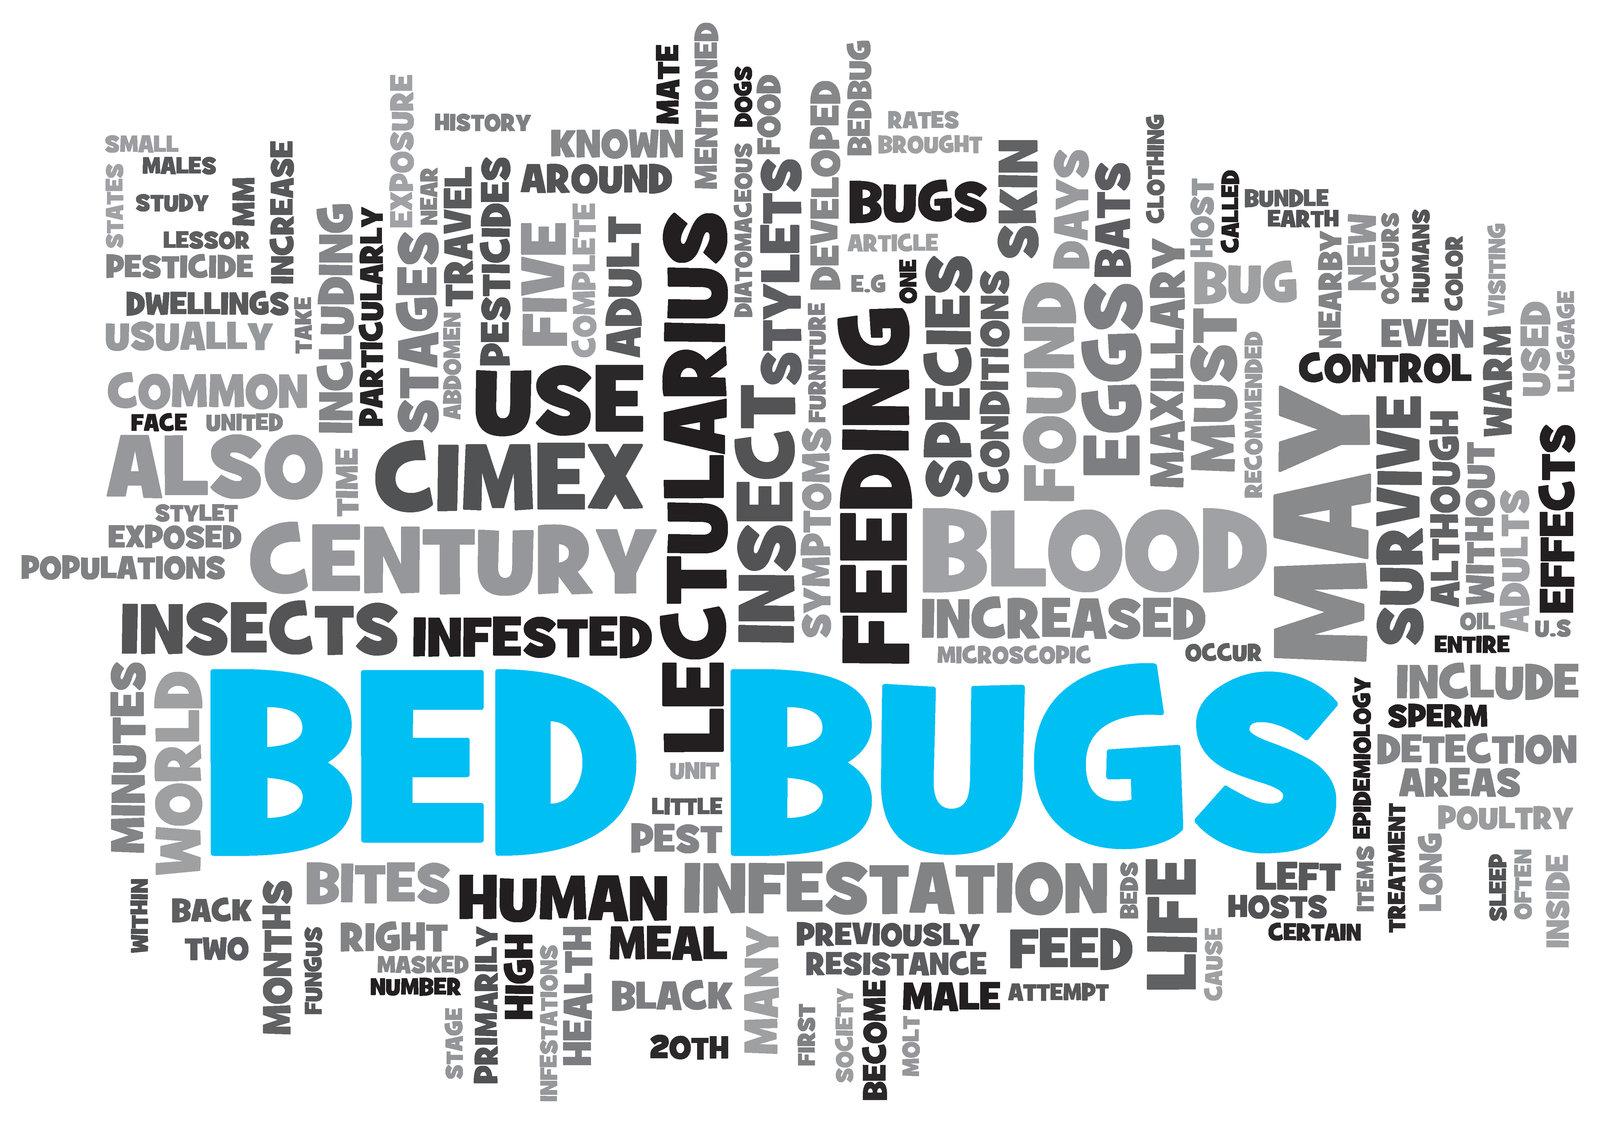 bedbug infestations can happen in a scottsdale home